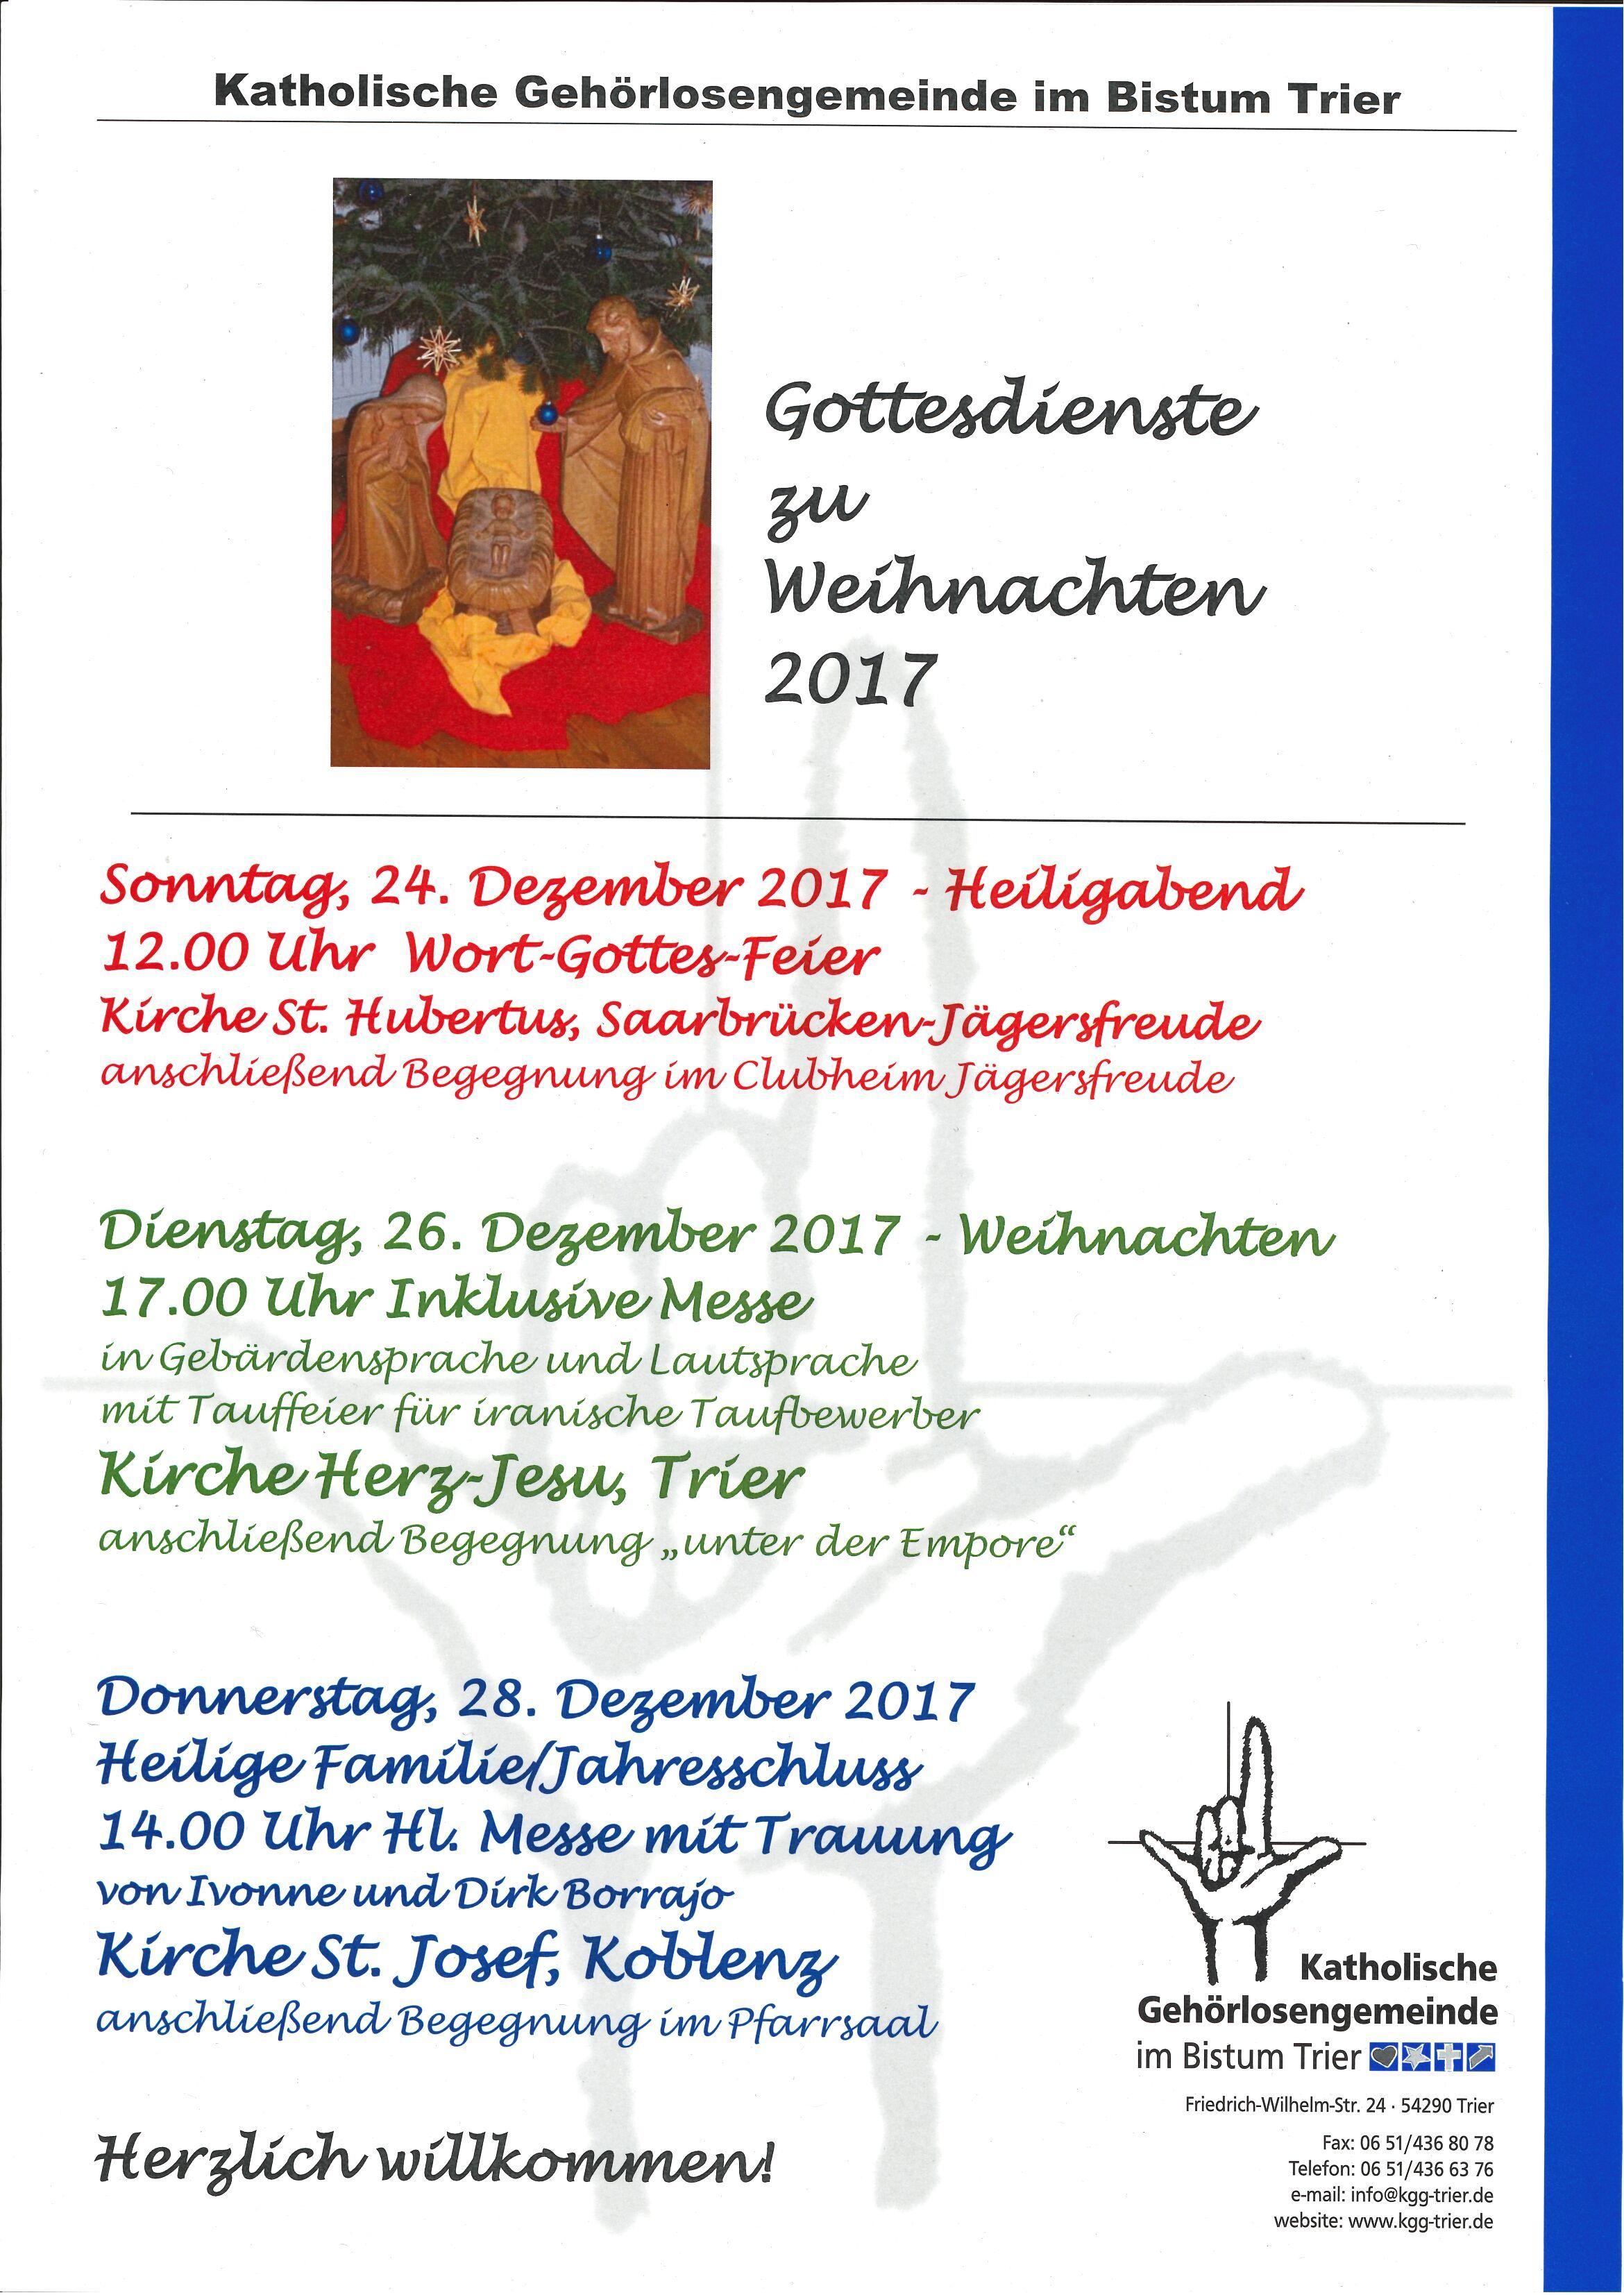 plakat-kgg-weihnachten 2017